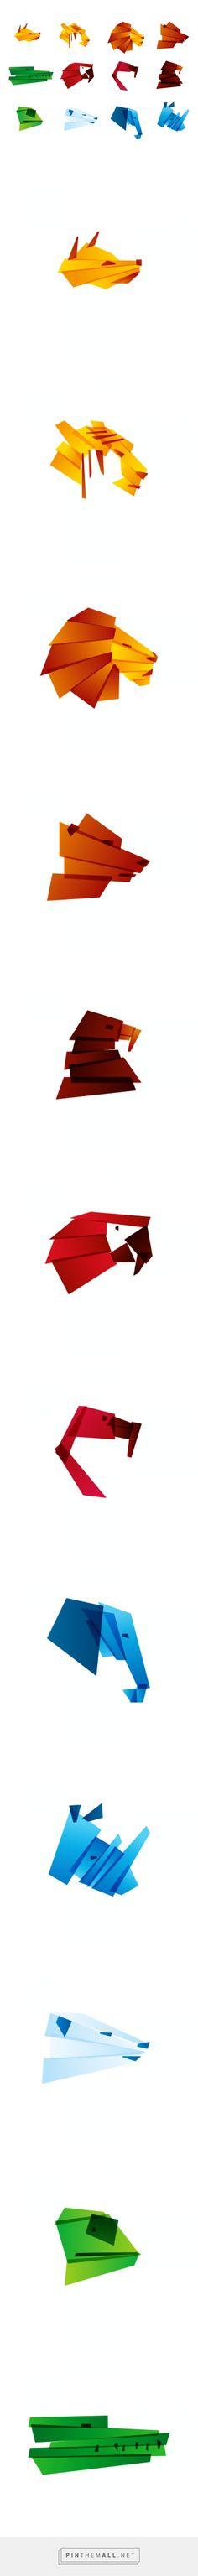 Zoo icons on Behance